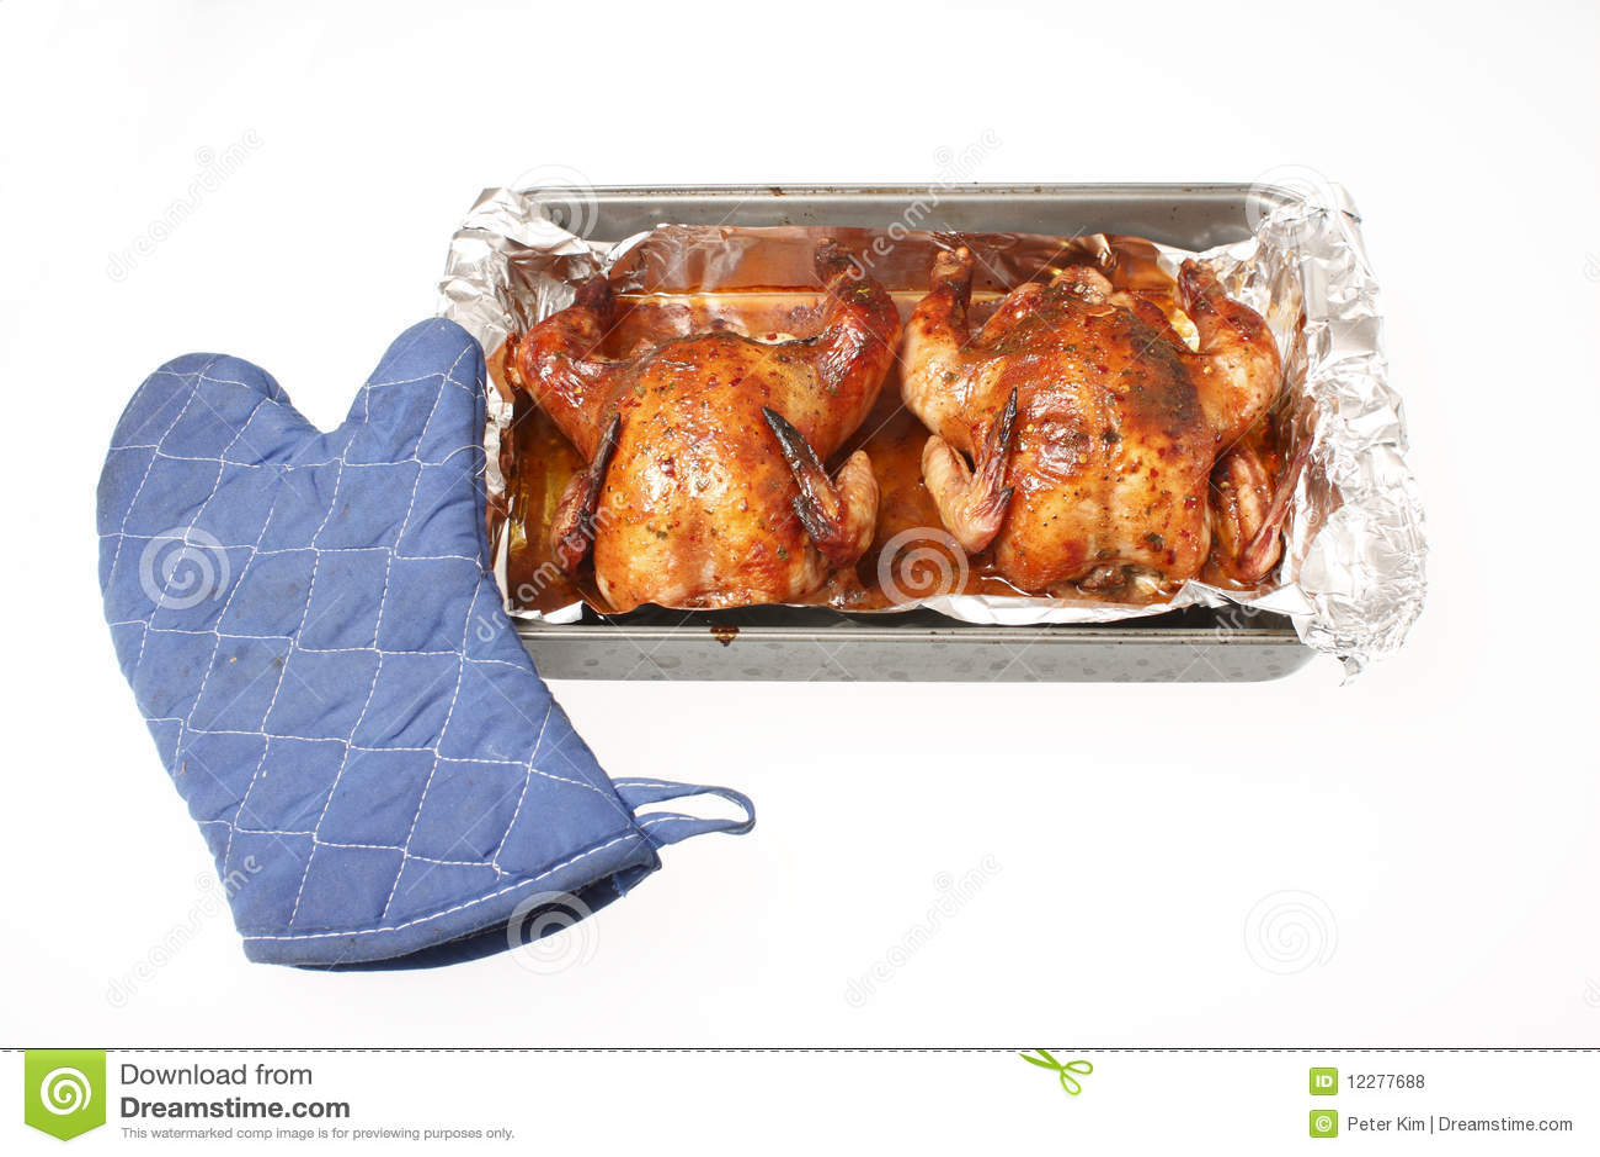 Baked Cornish game hen